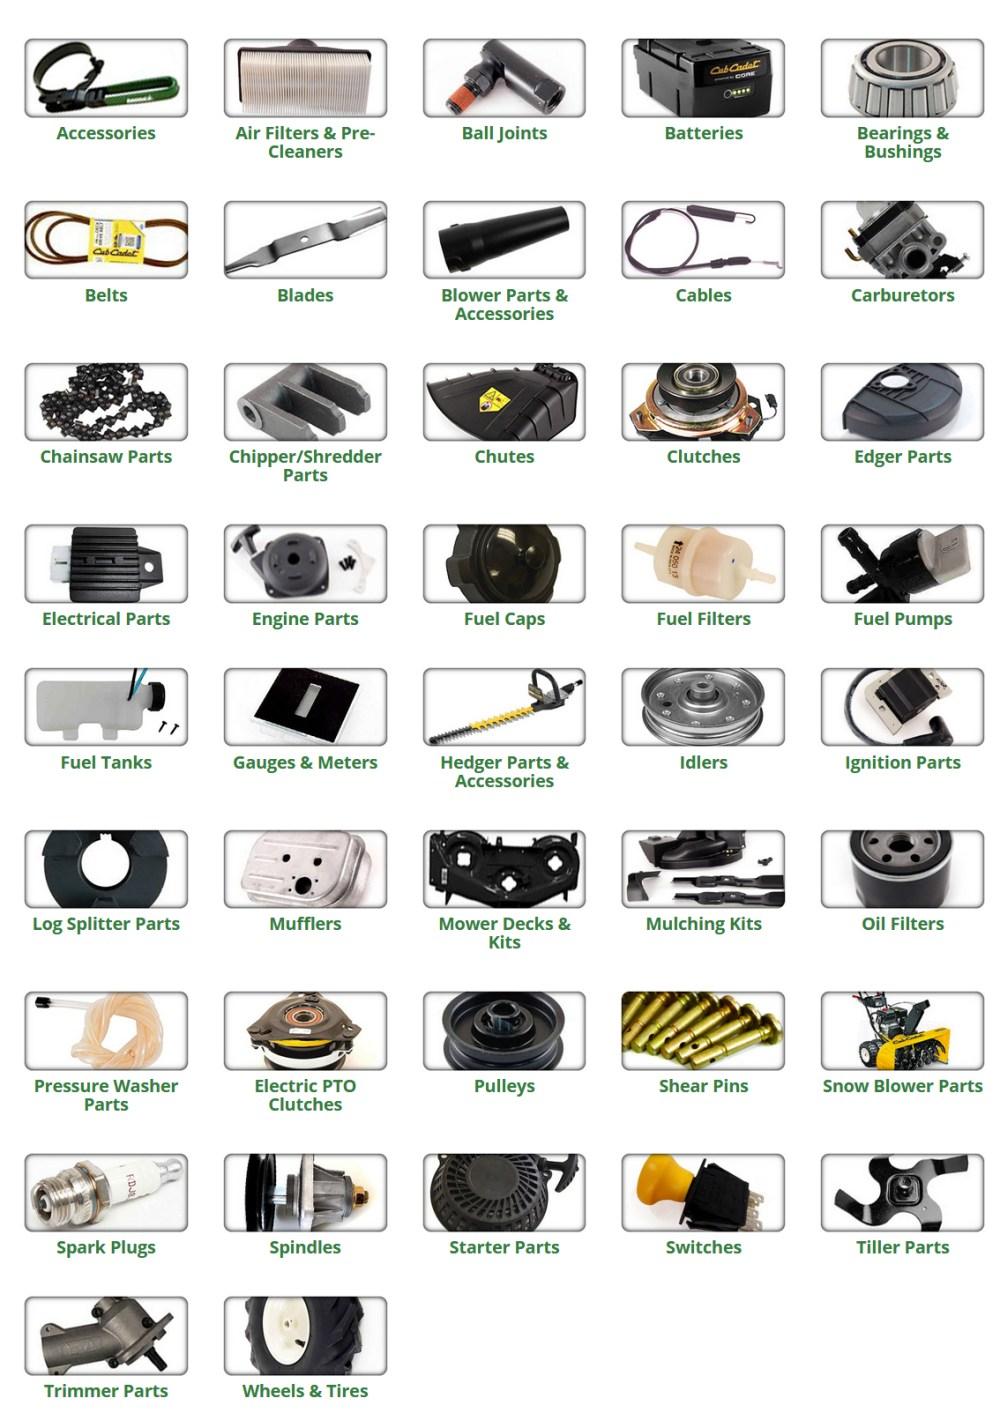 medium resolution of cub cadet parts and accessories